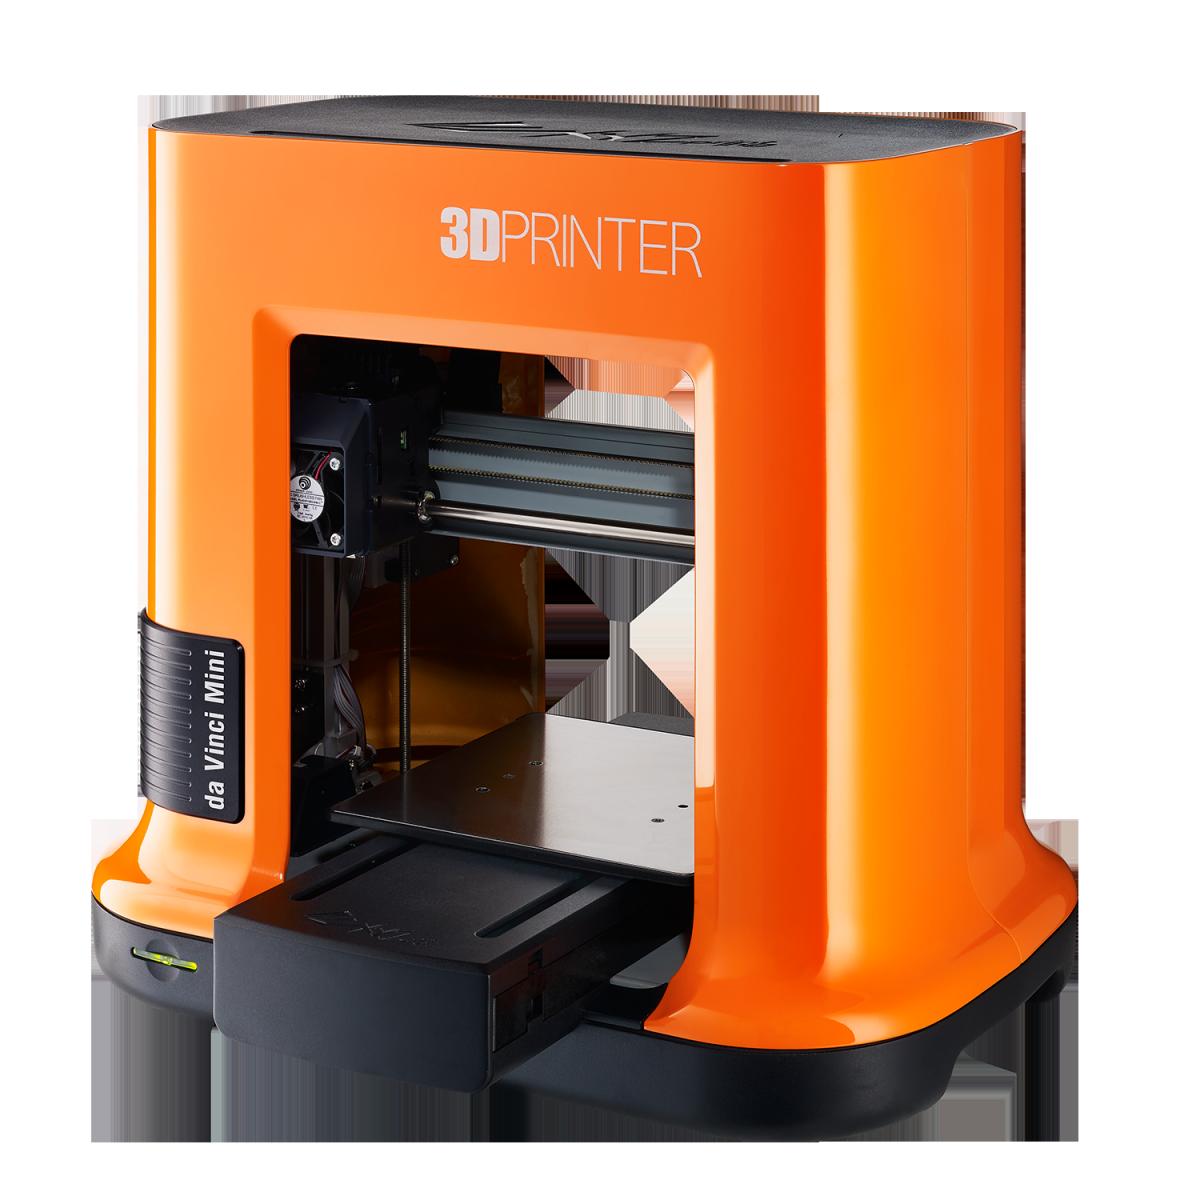 Køb Da Vinci Mini W 3D Printer